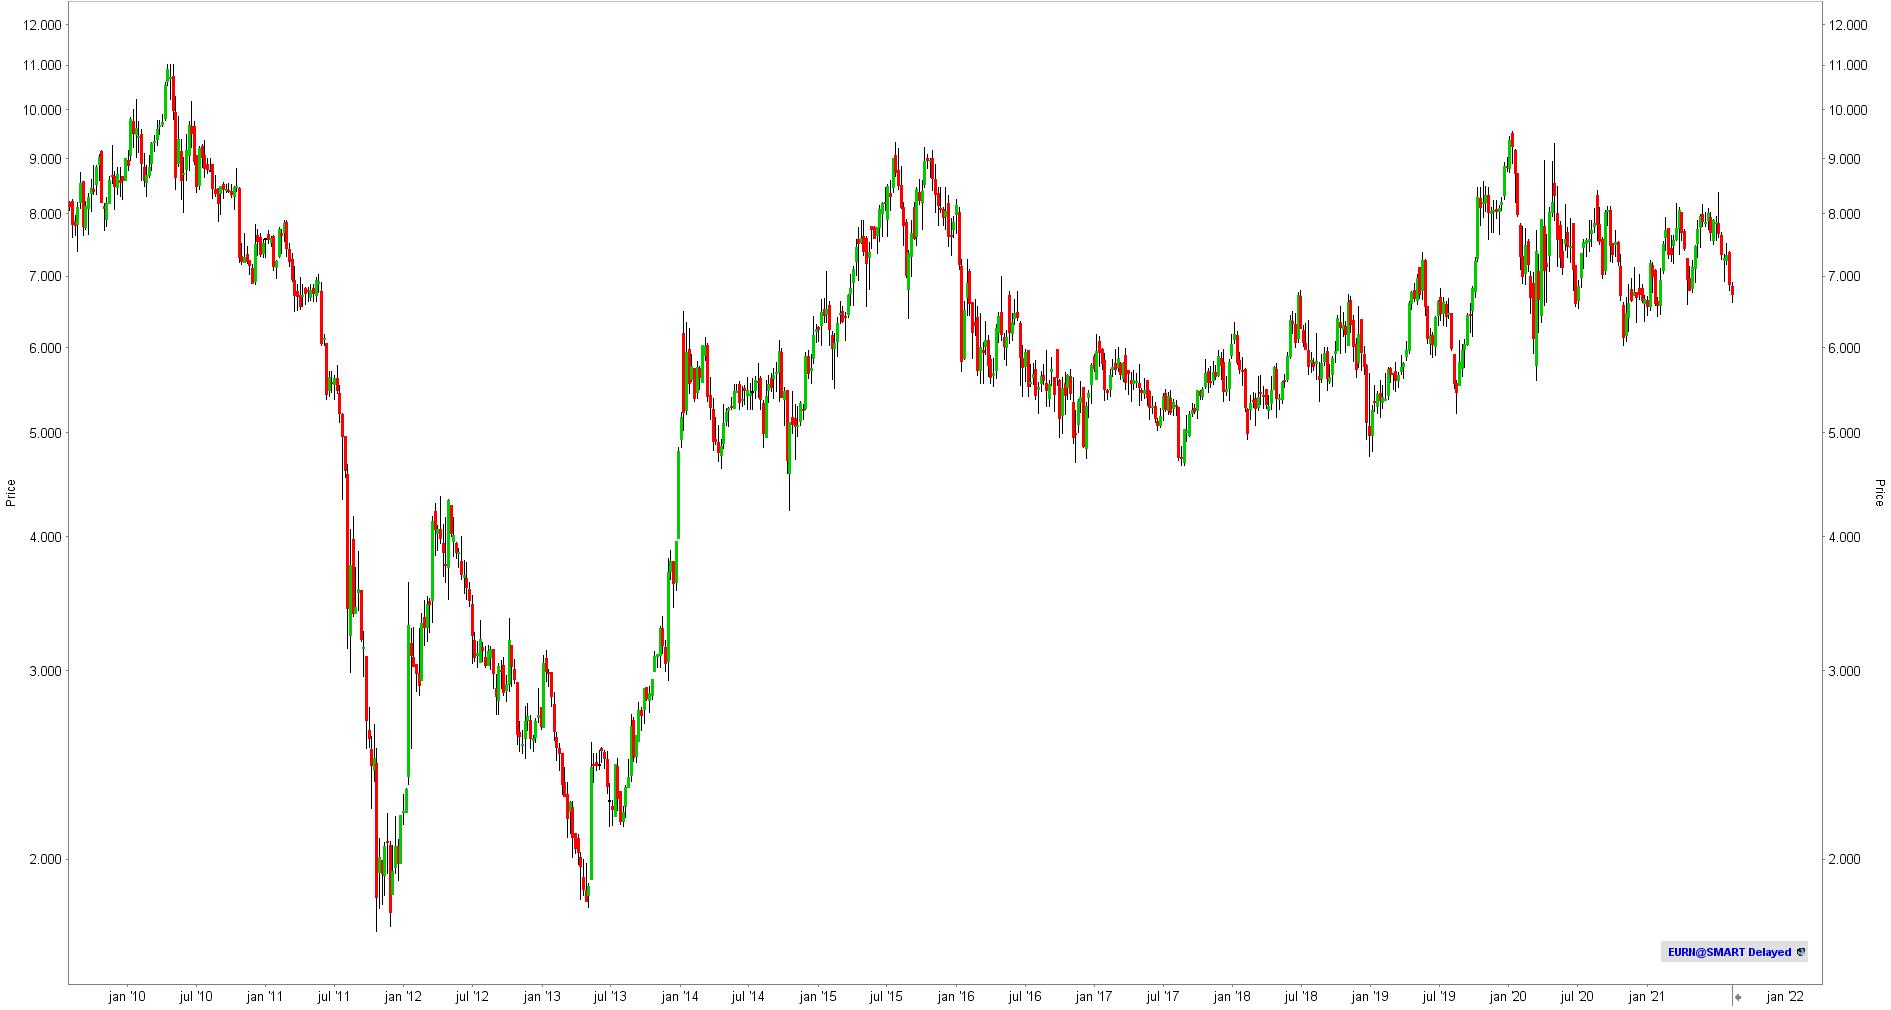 Aandeel Euronav - Koers